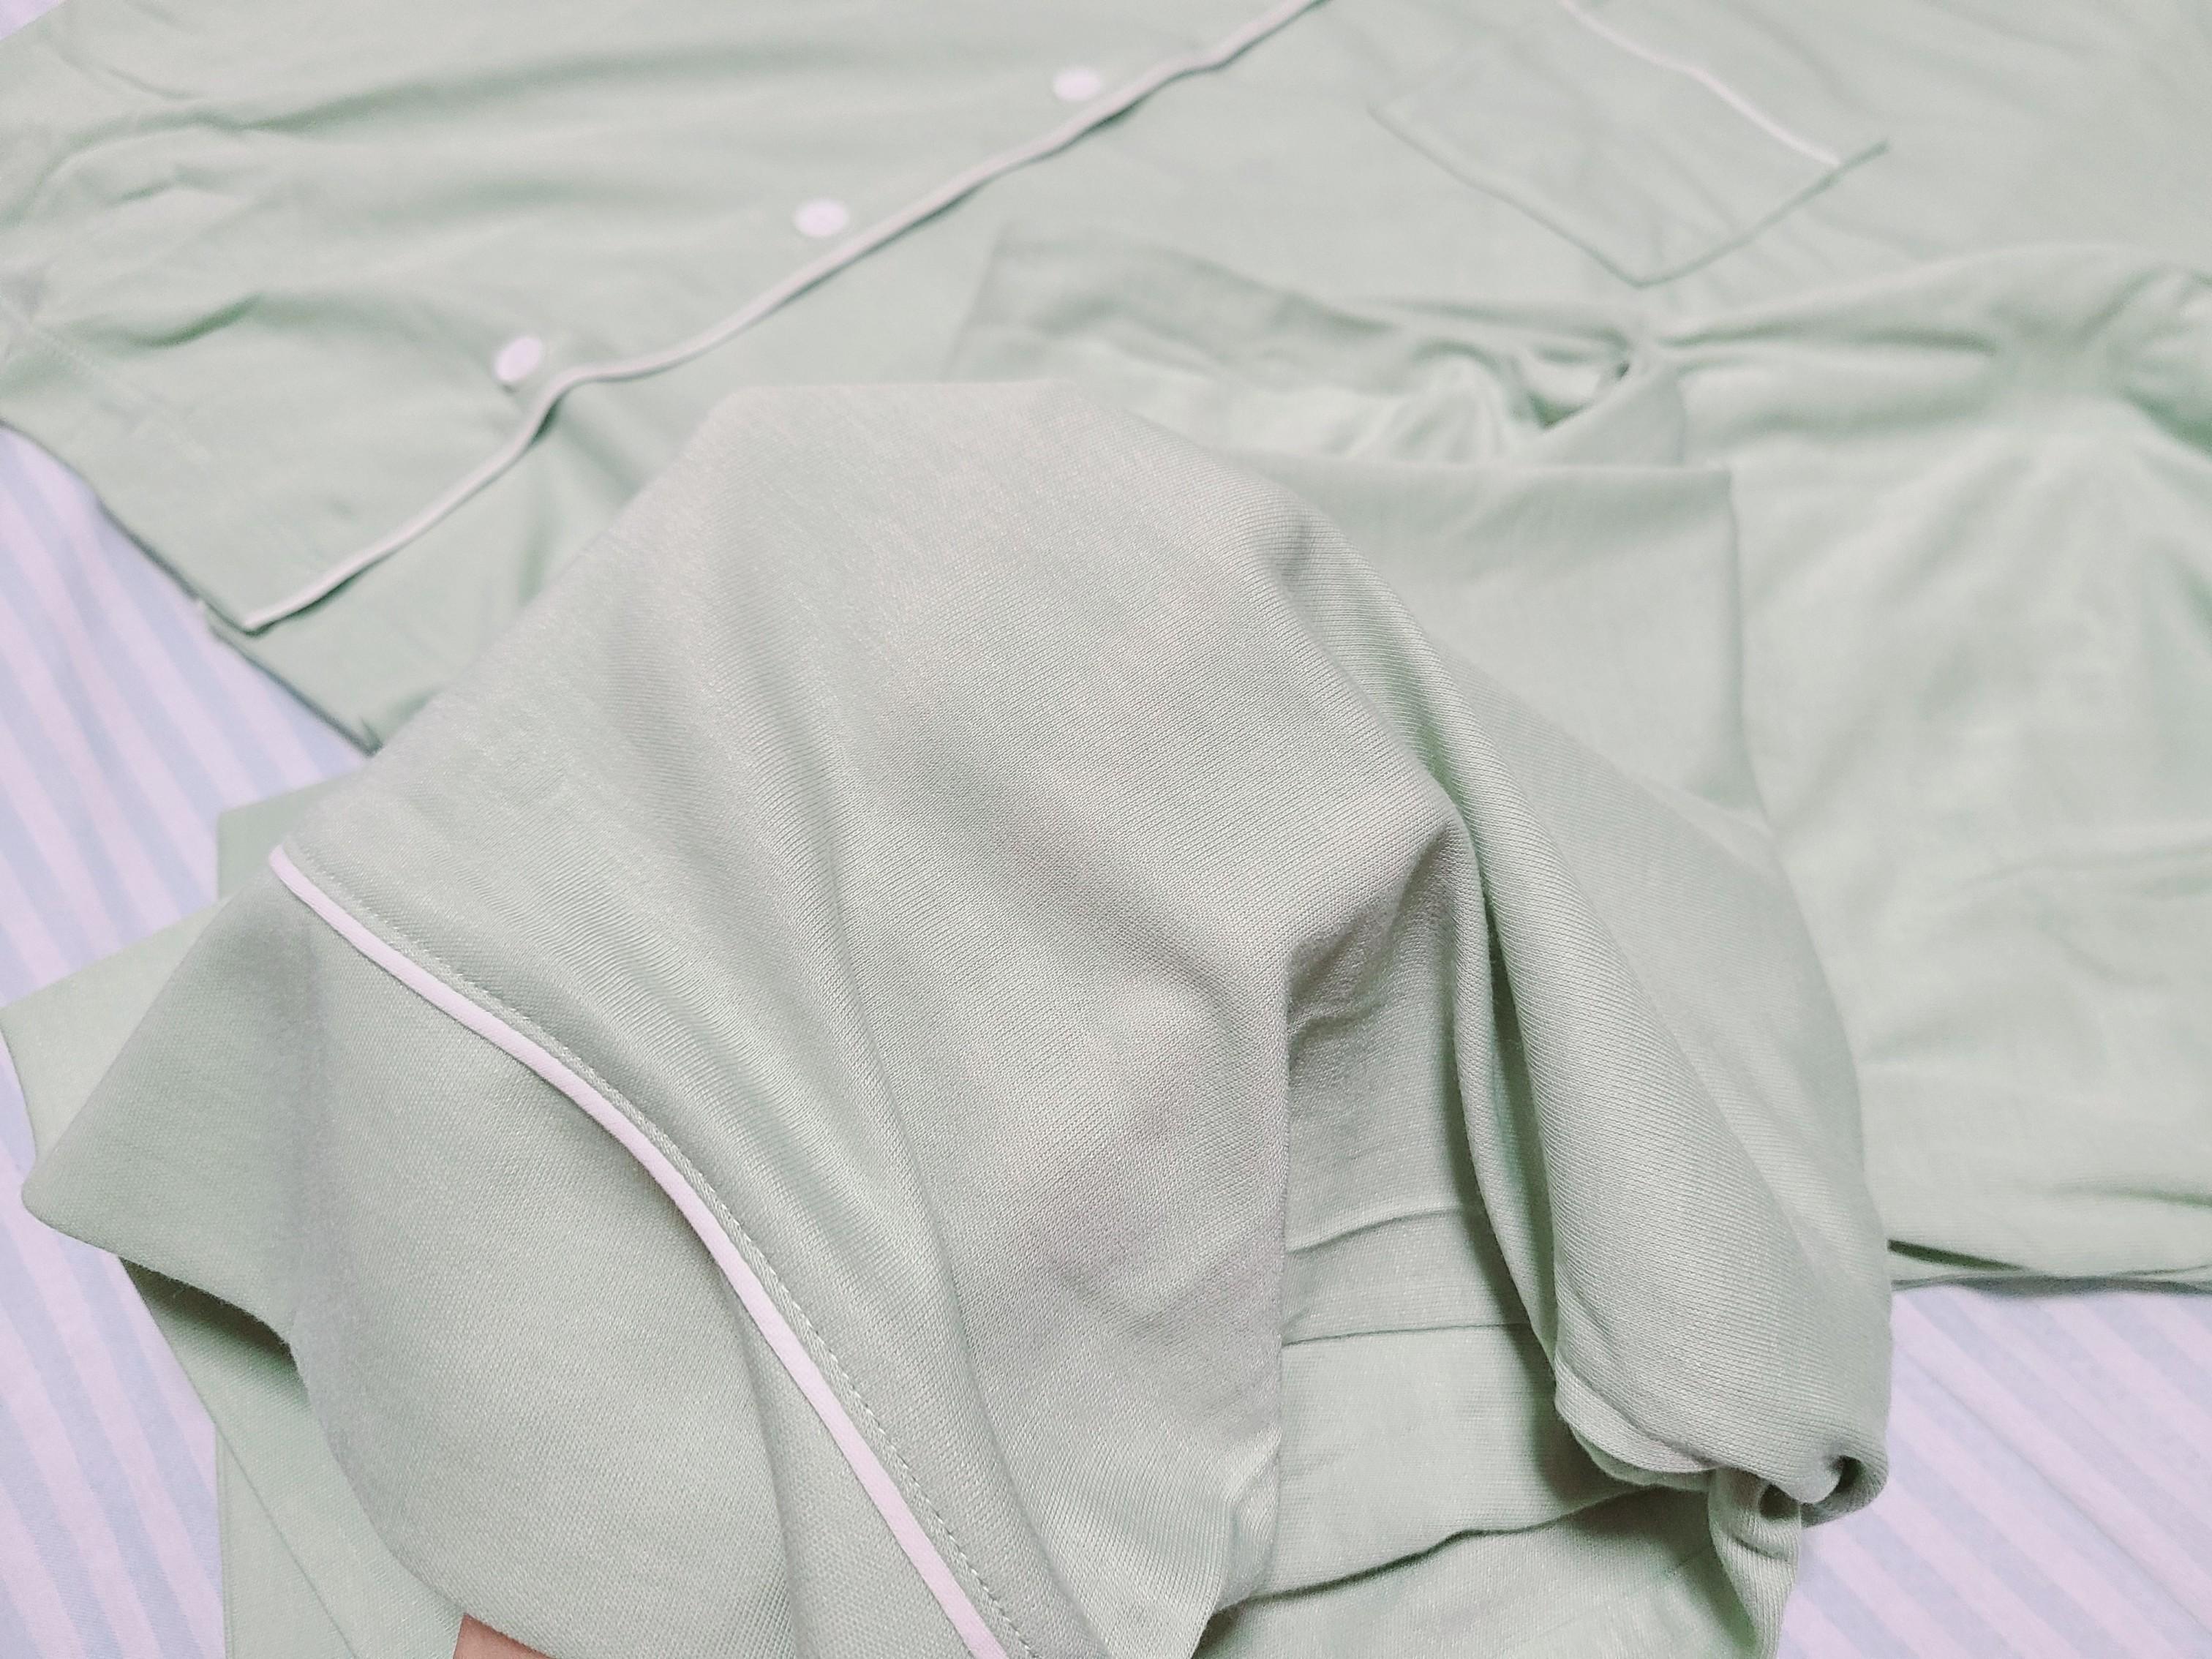 【GU×SABONコラボ第2弾】8/24発売!アロエパジャマがかわいいだけじゃない!しっとり質感でうっとり❤️_6